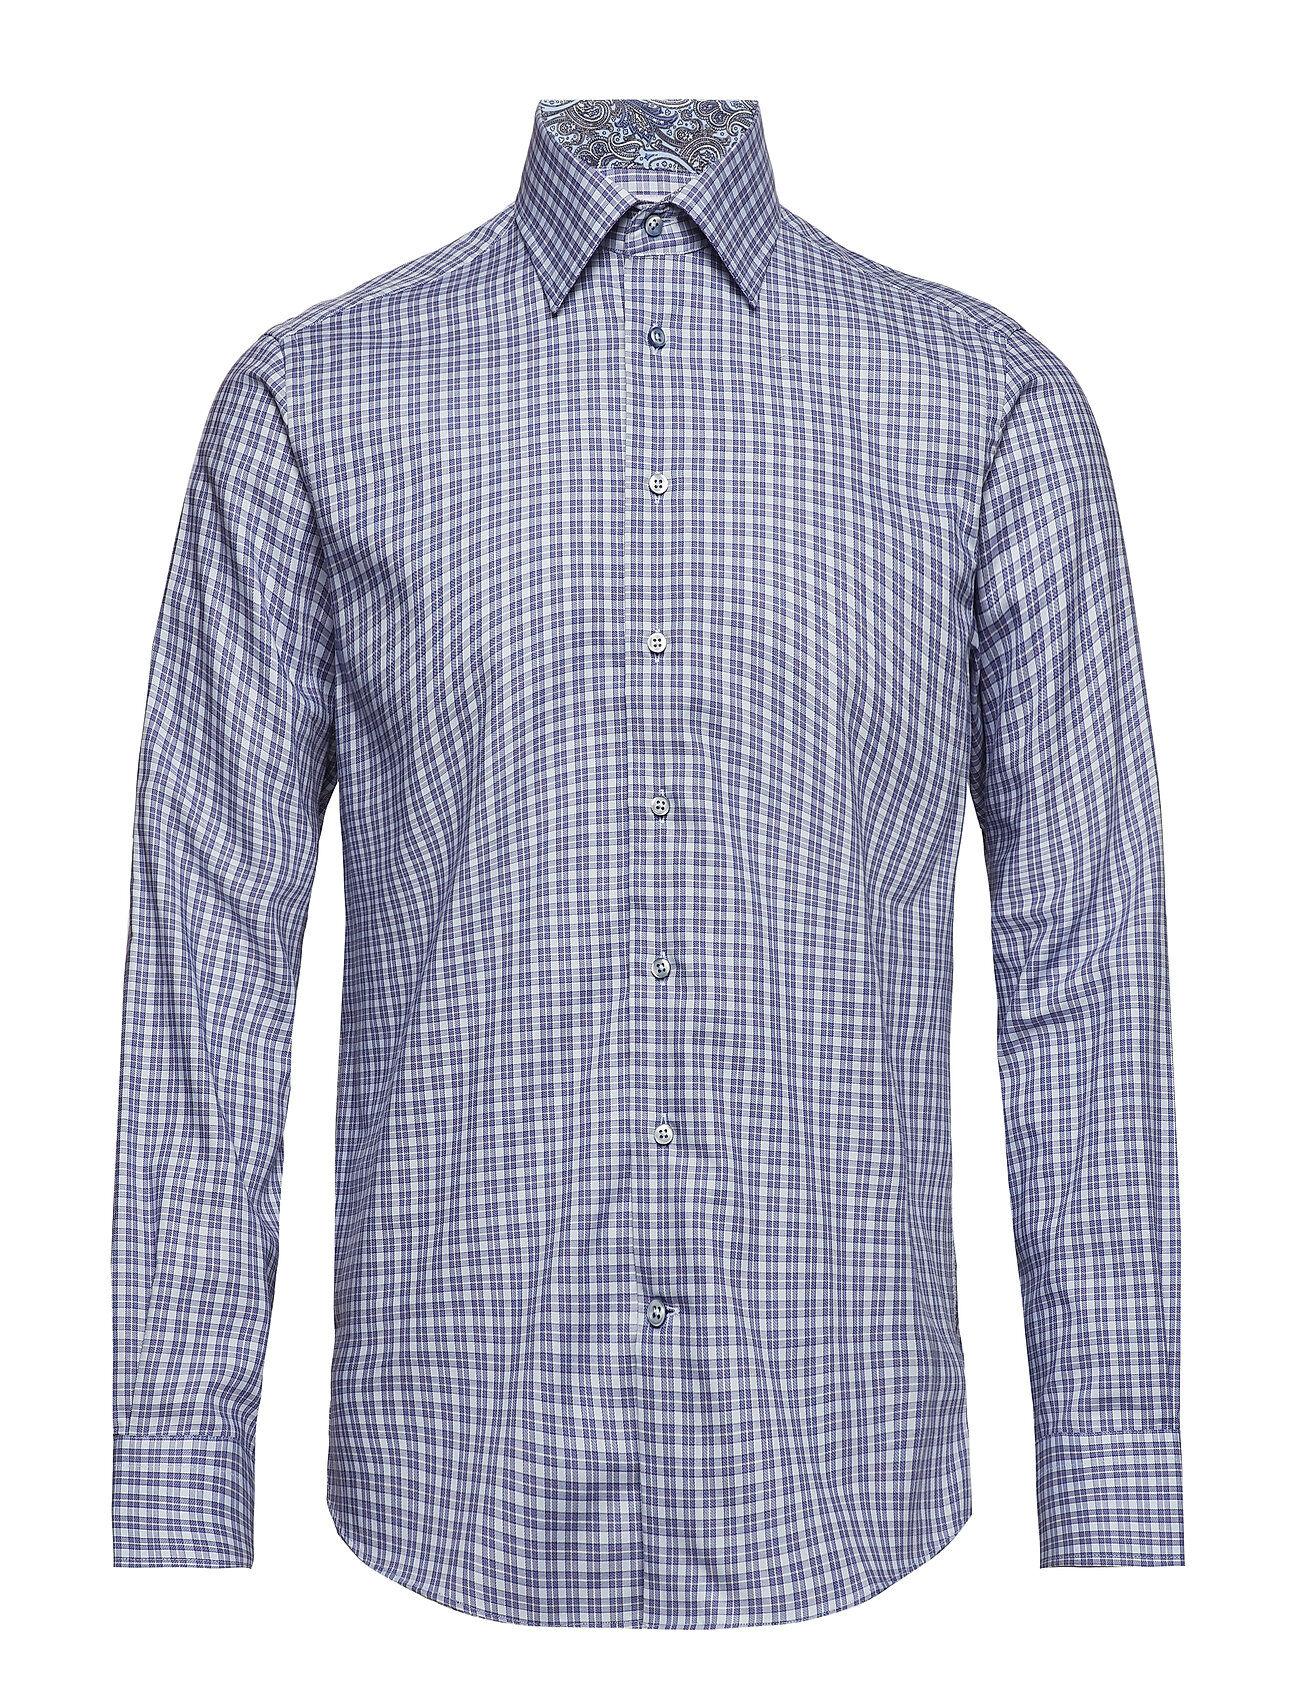 XO Shirtmaker by Sand Copenhagen 8059 Details - Gordon Sc